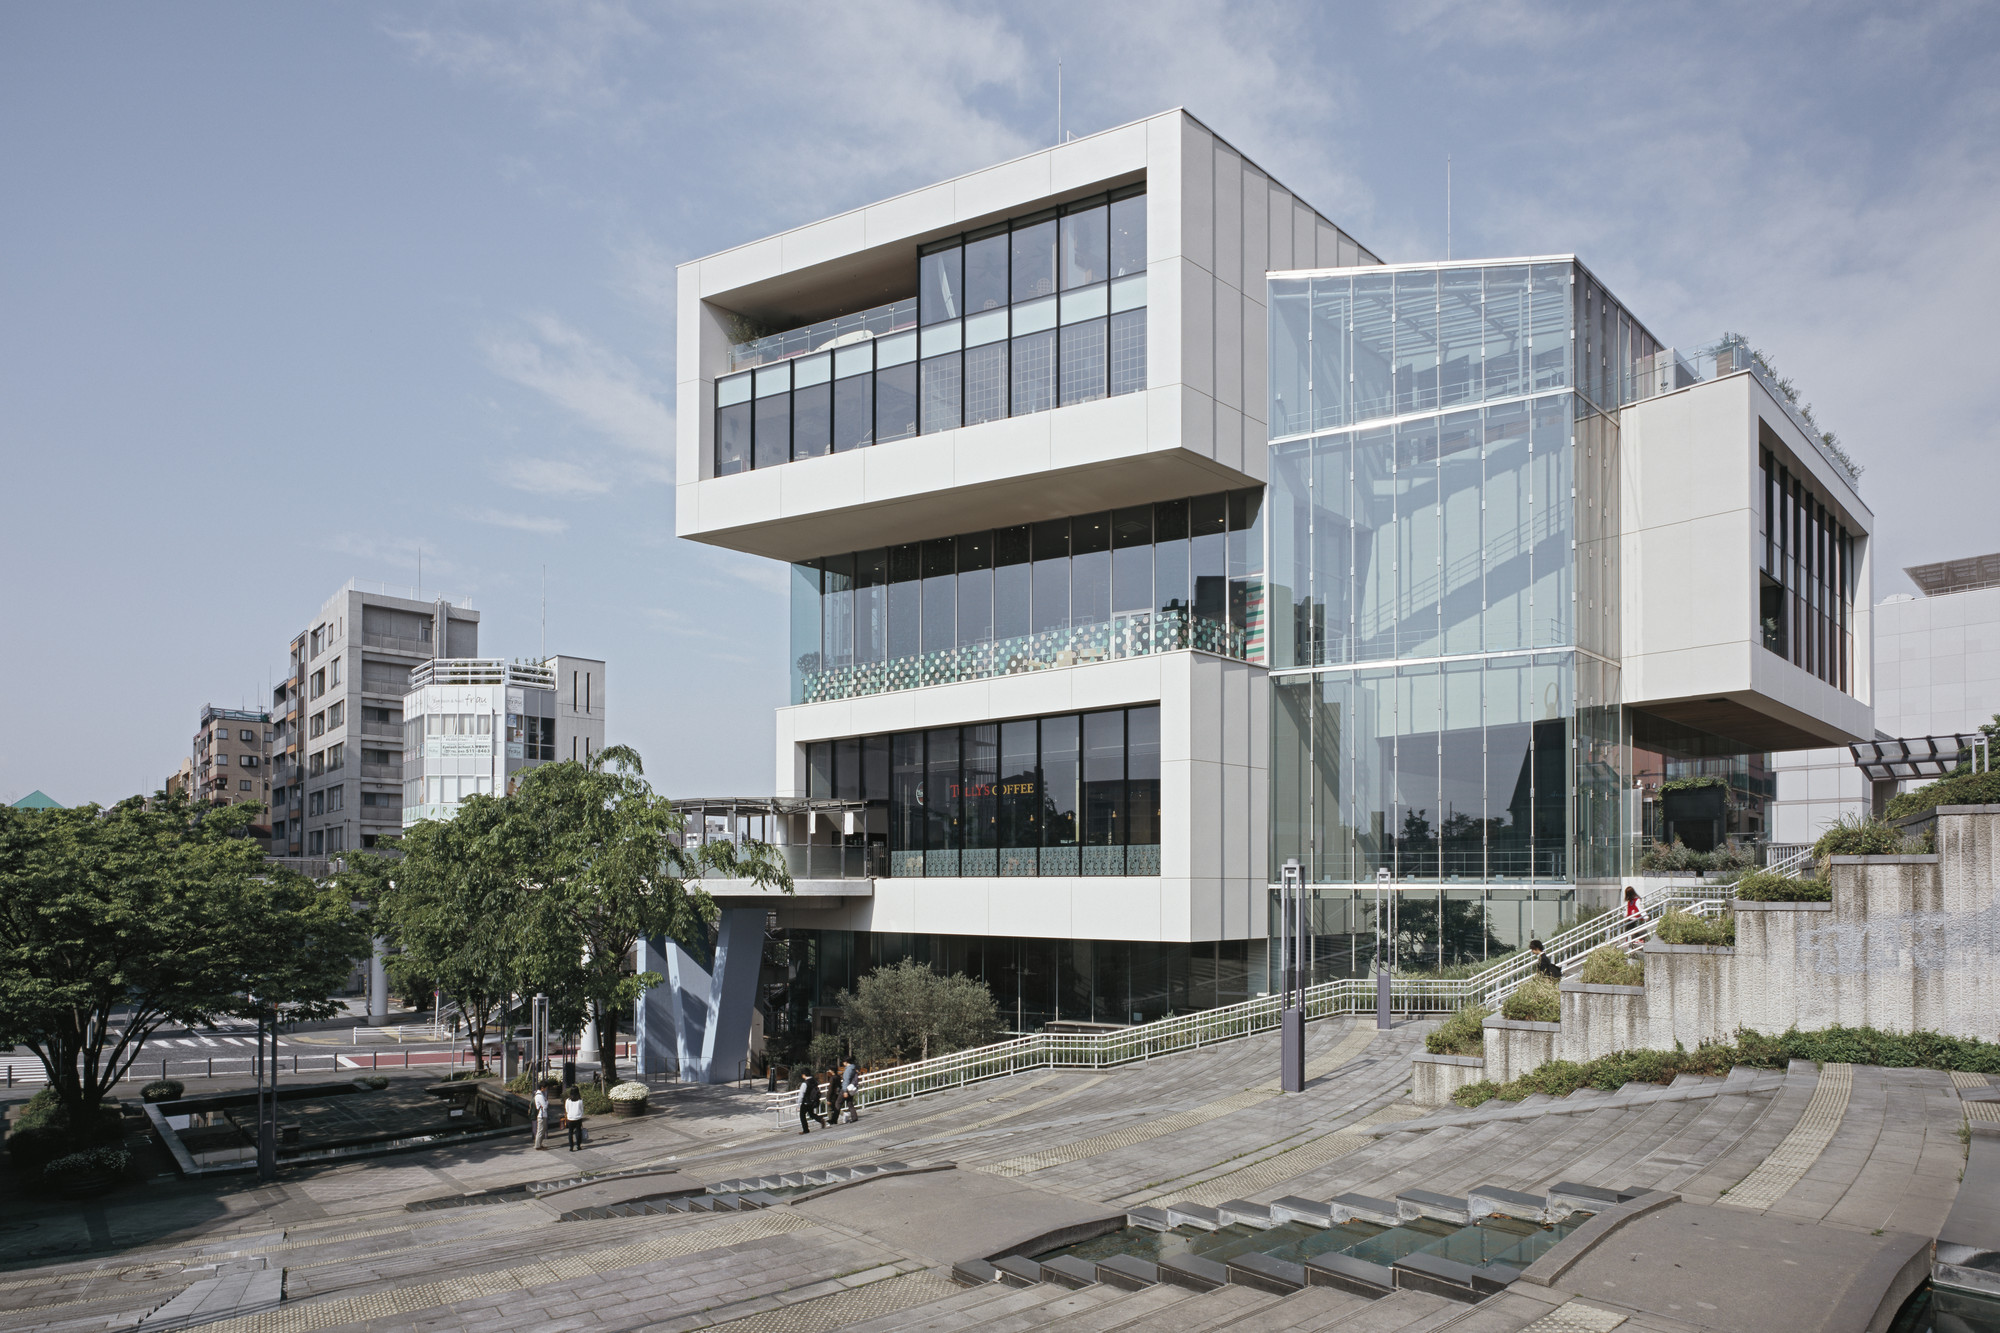 Yotsubako / Mount Fuji Architects Studio + Taisei Design Planners Architects, © Ken'ichi Suzuki